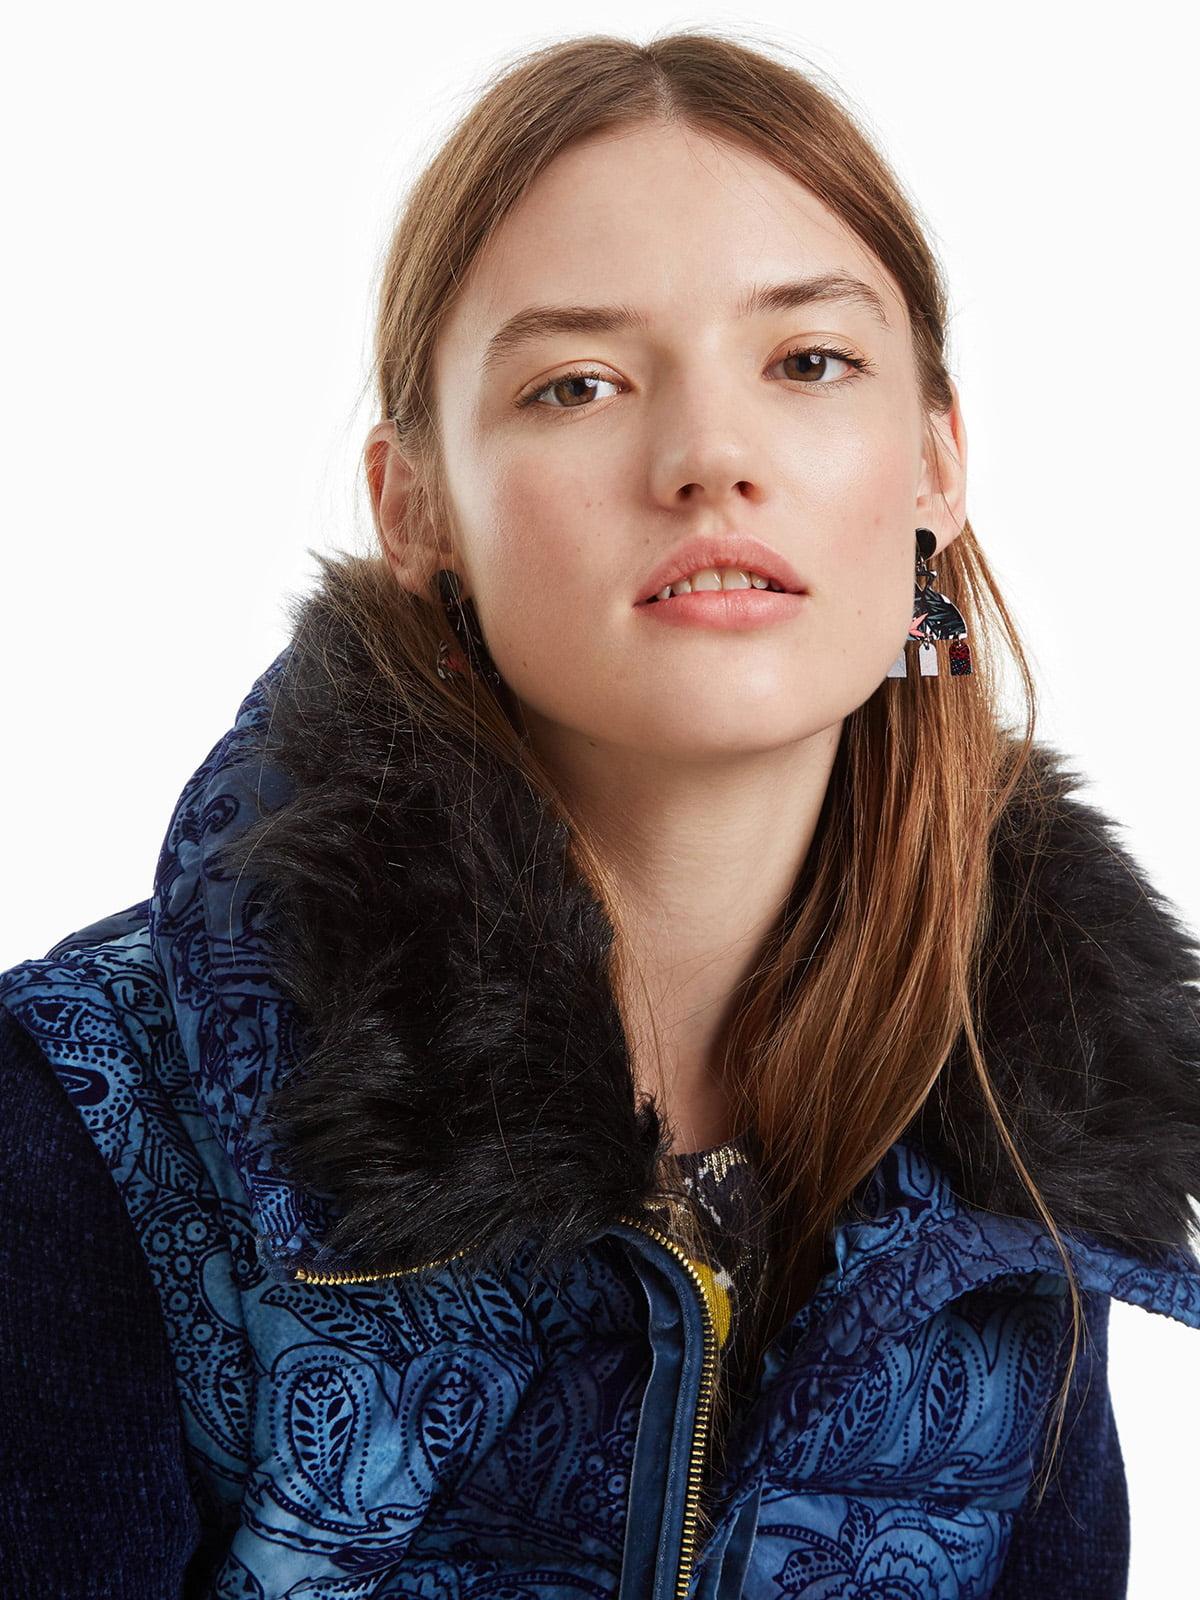 Куртка синя з принтом | 4524254 | фото 4